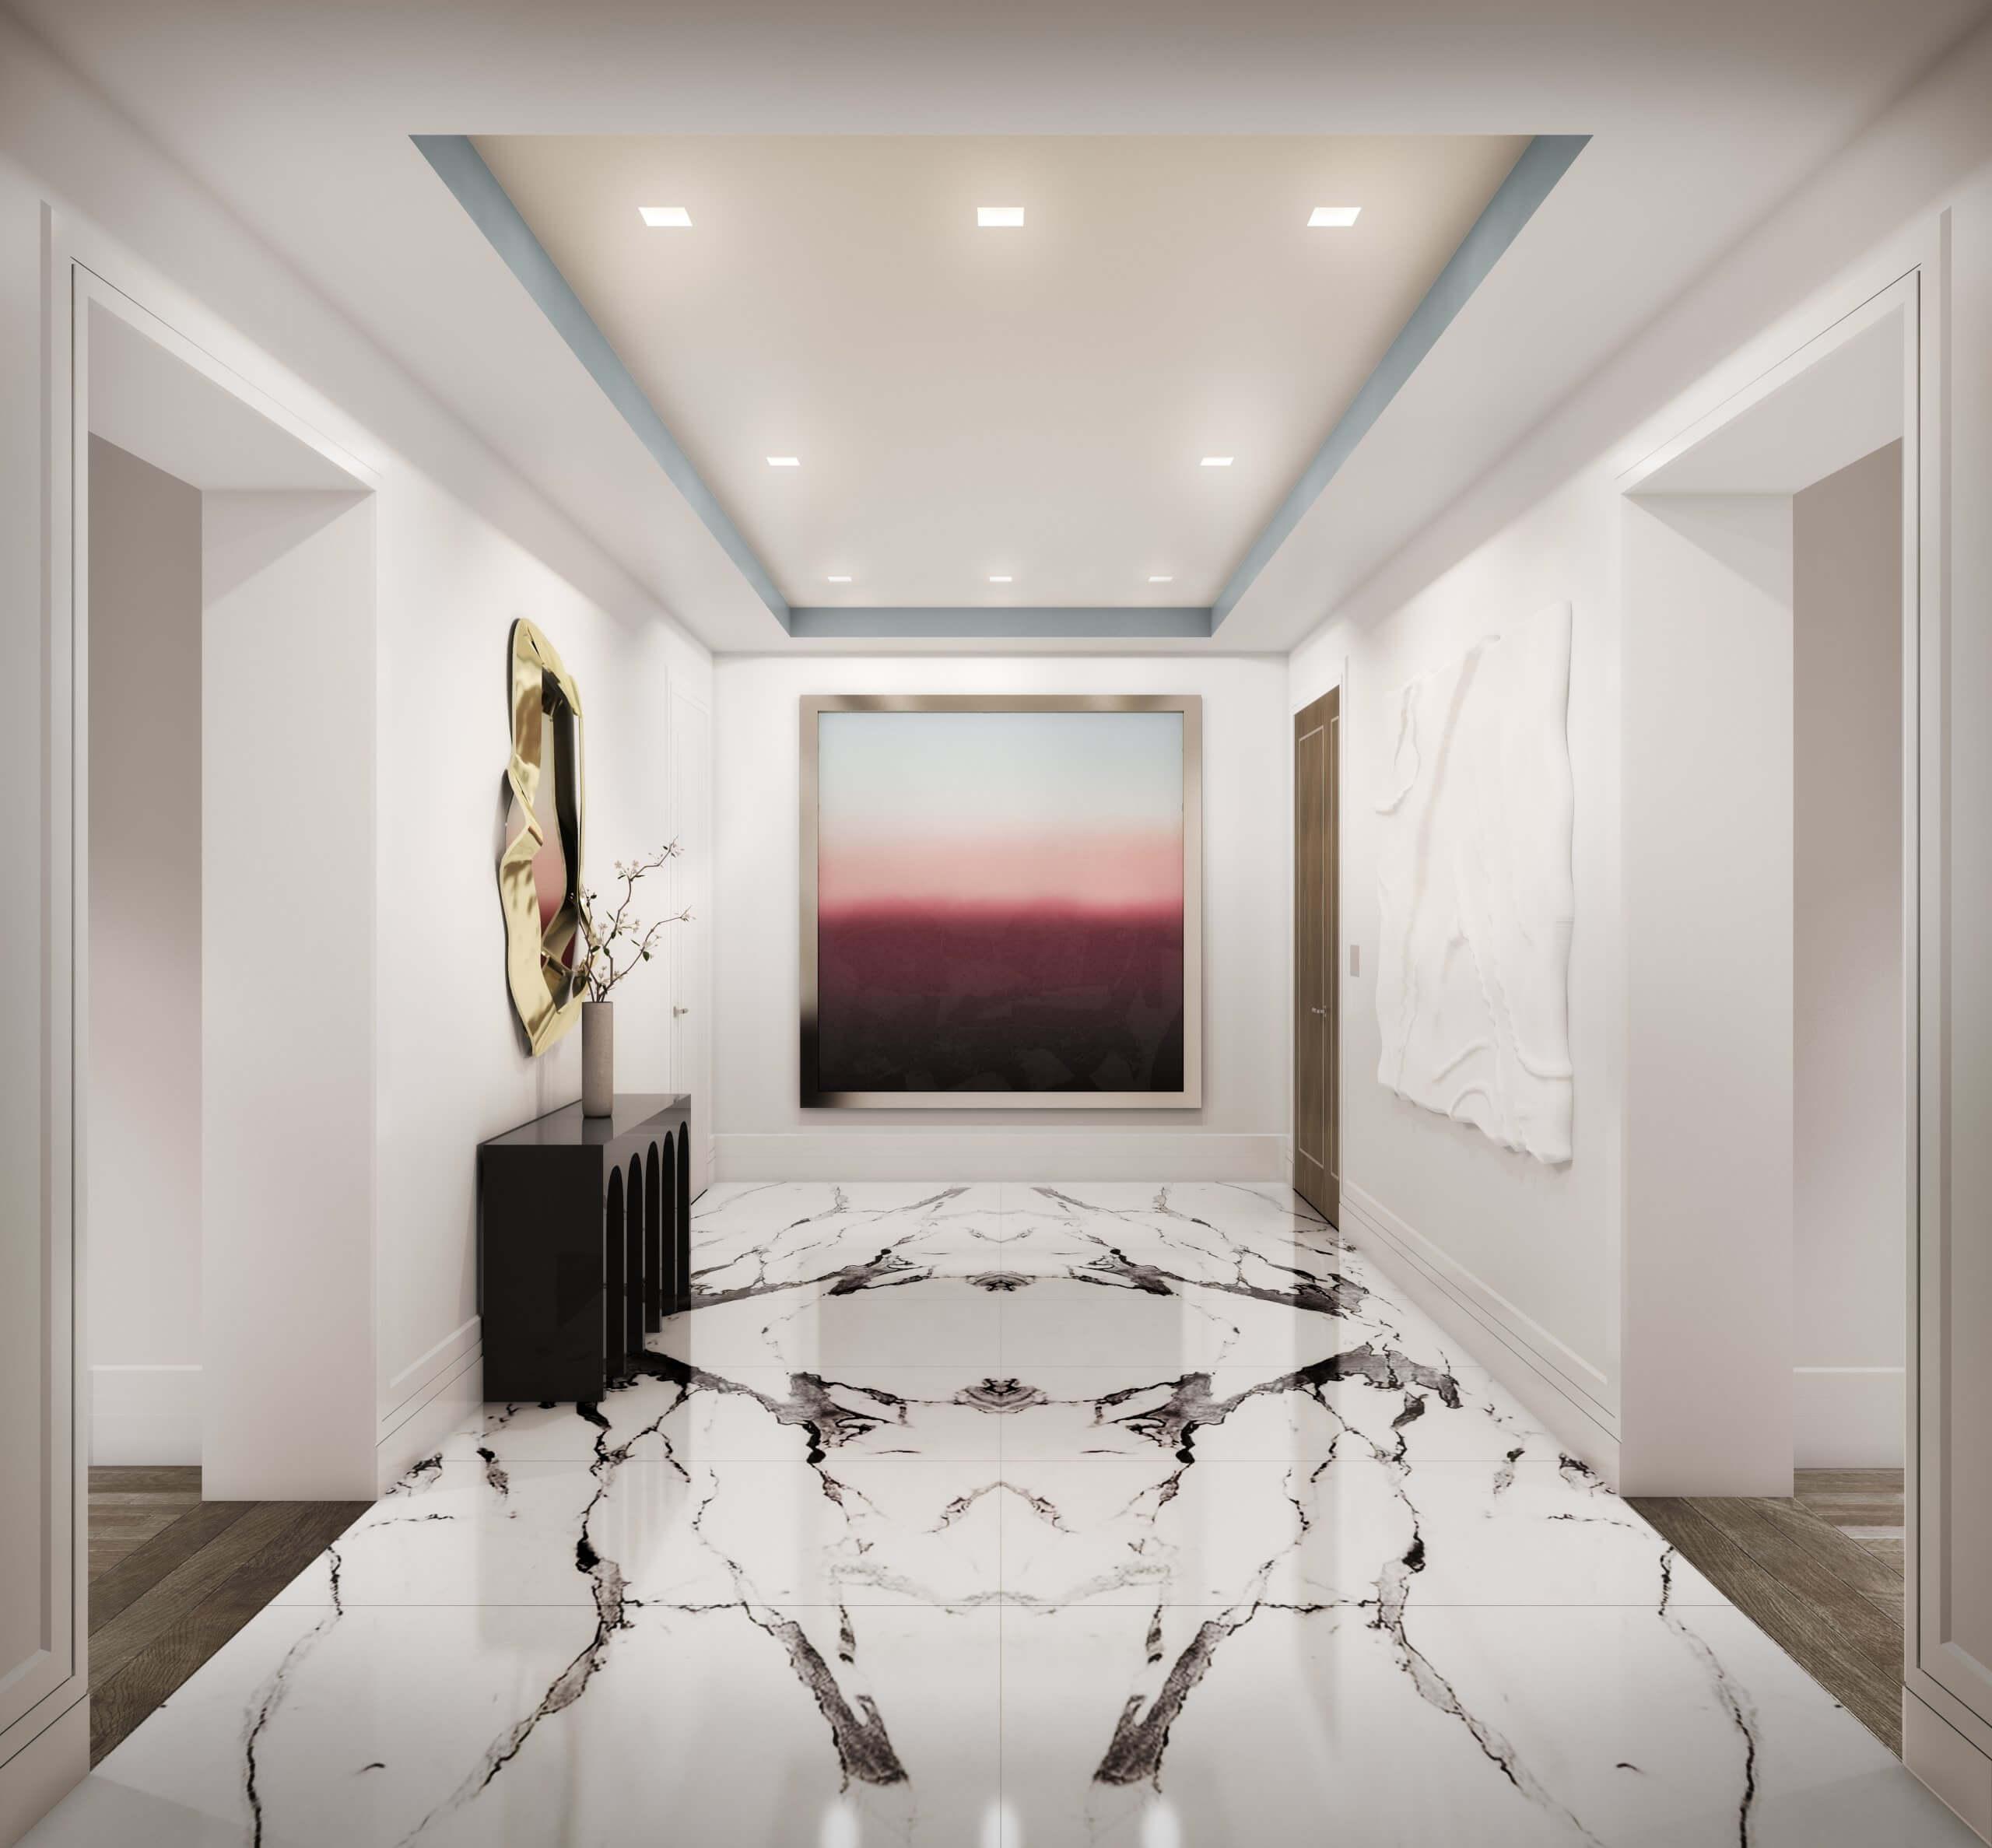 MM001-01-C12-R04-Foyer